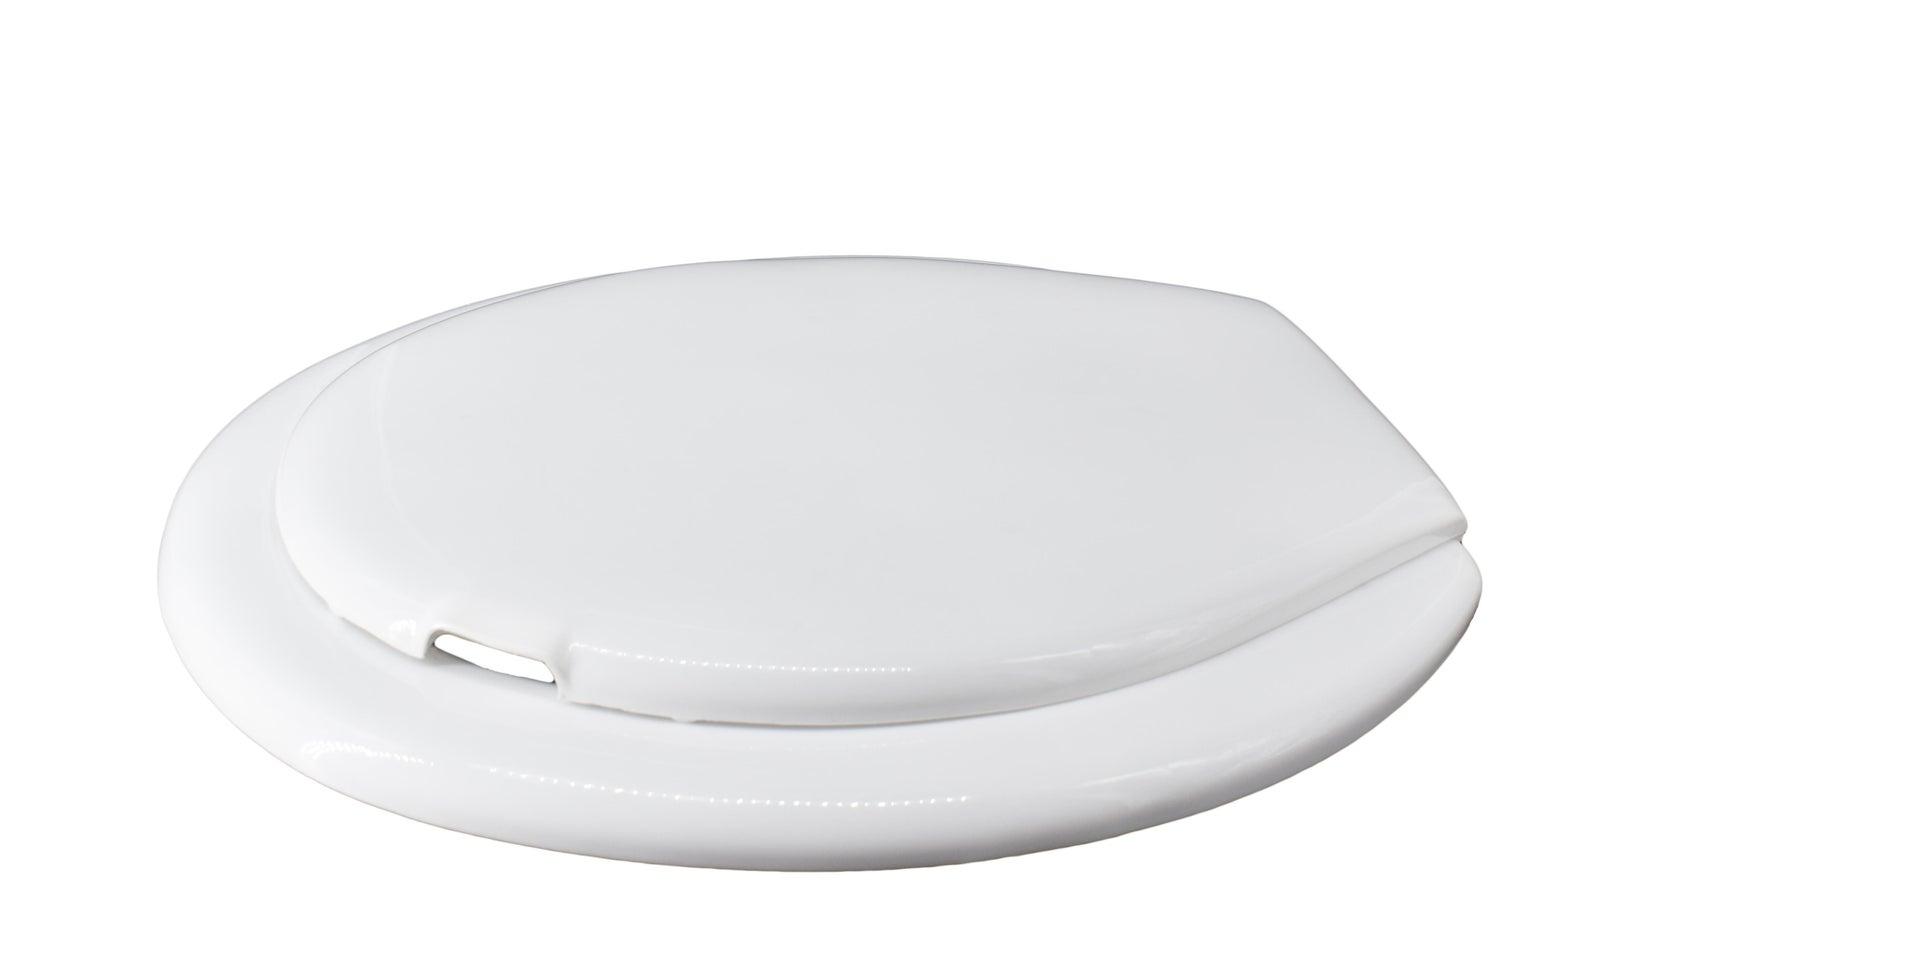 Copriwater ovale Universale Cefalo plastica bianco - 4